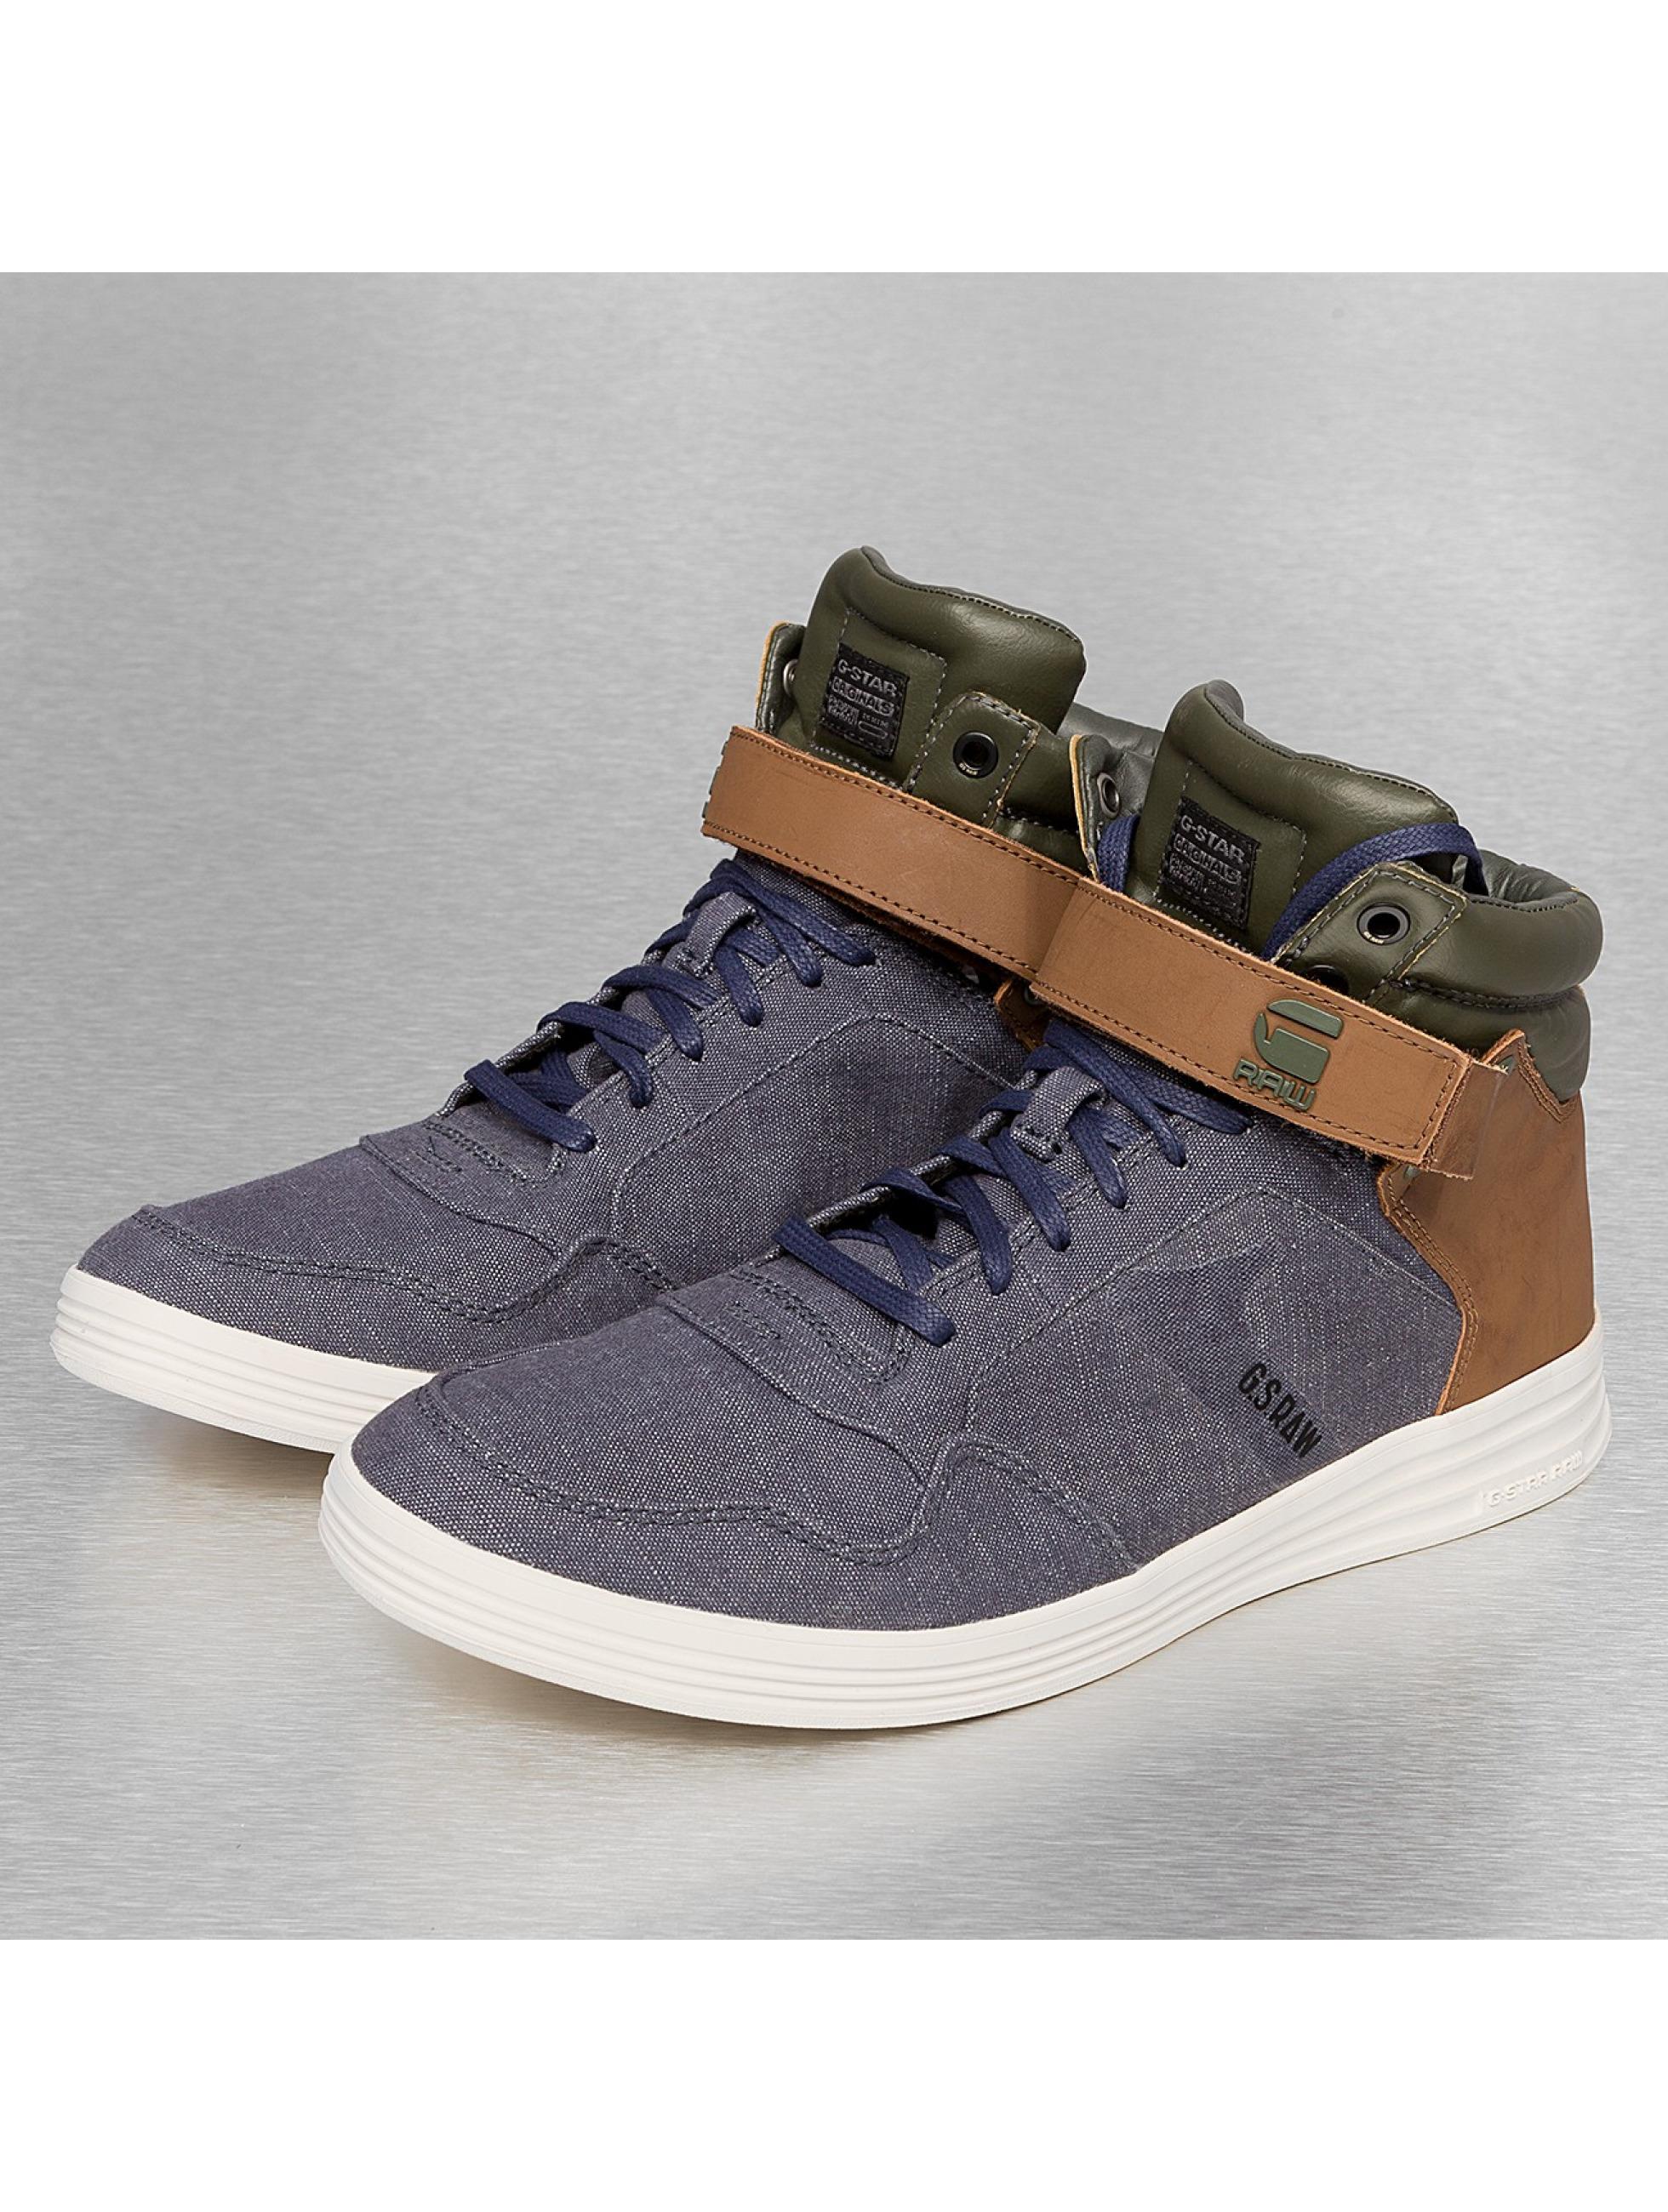 g star footwear schuhe sneaker futura outland strap. Black Bedroom Furniture Sets. Home Design Ideas